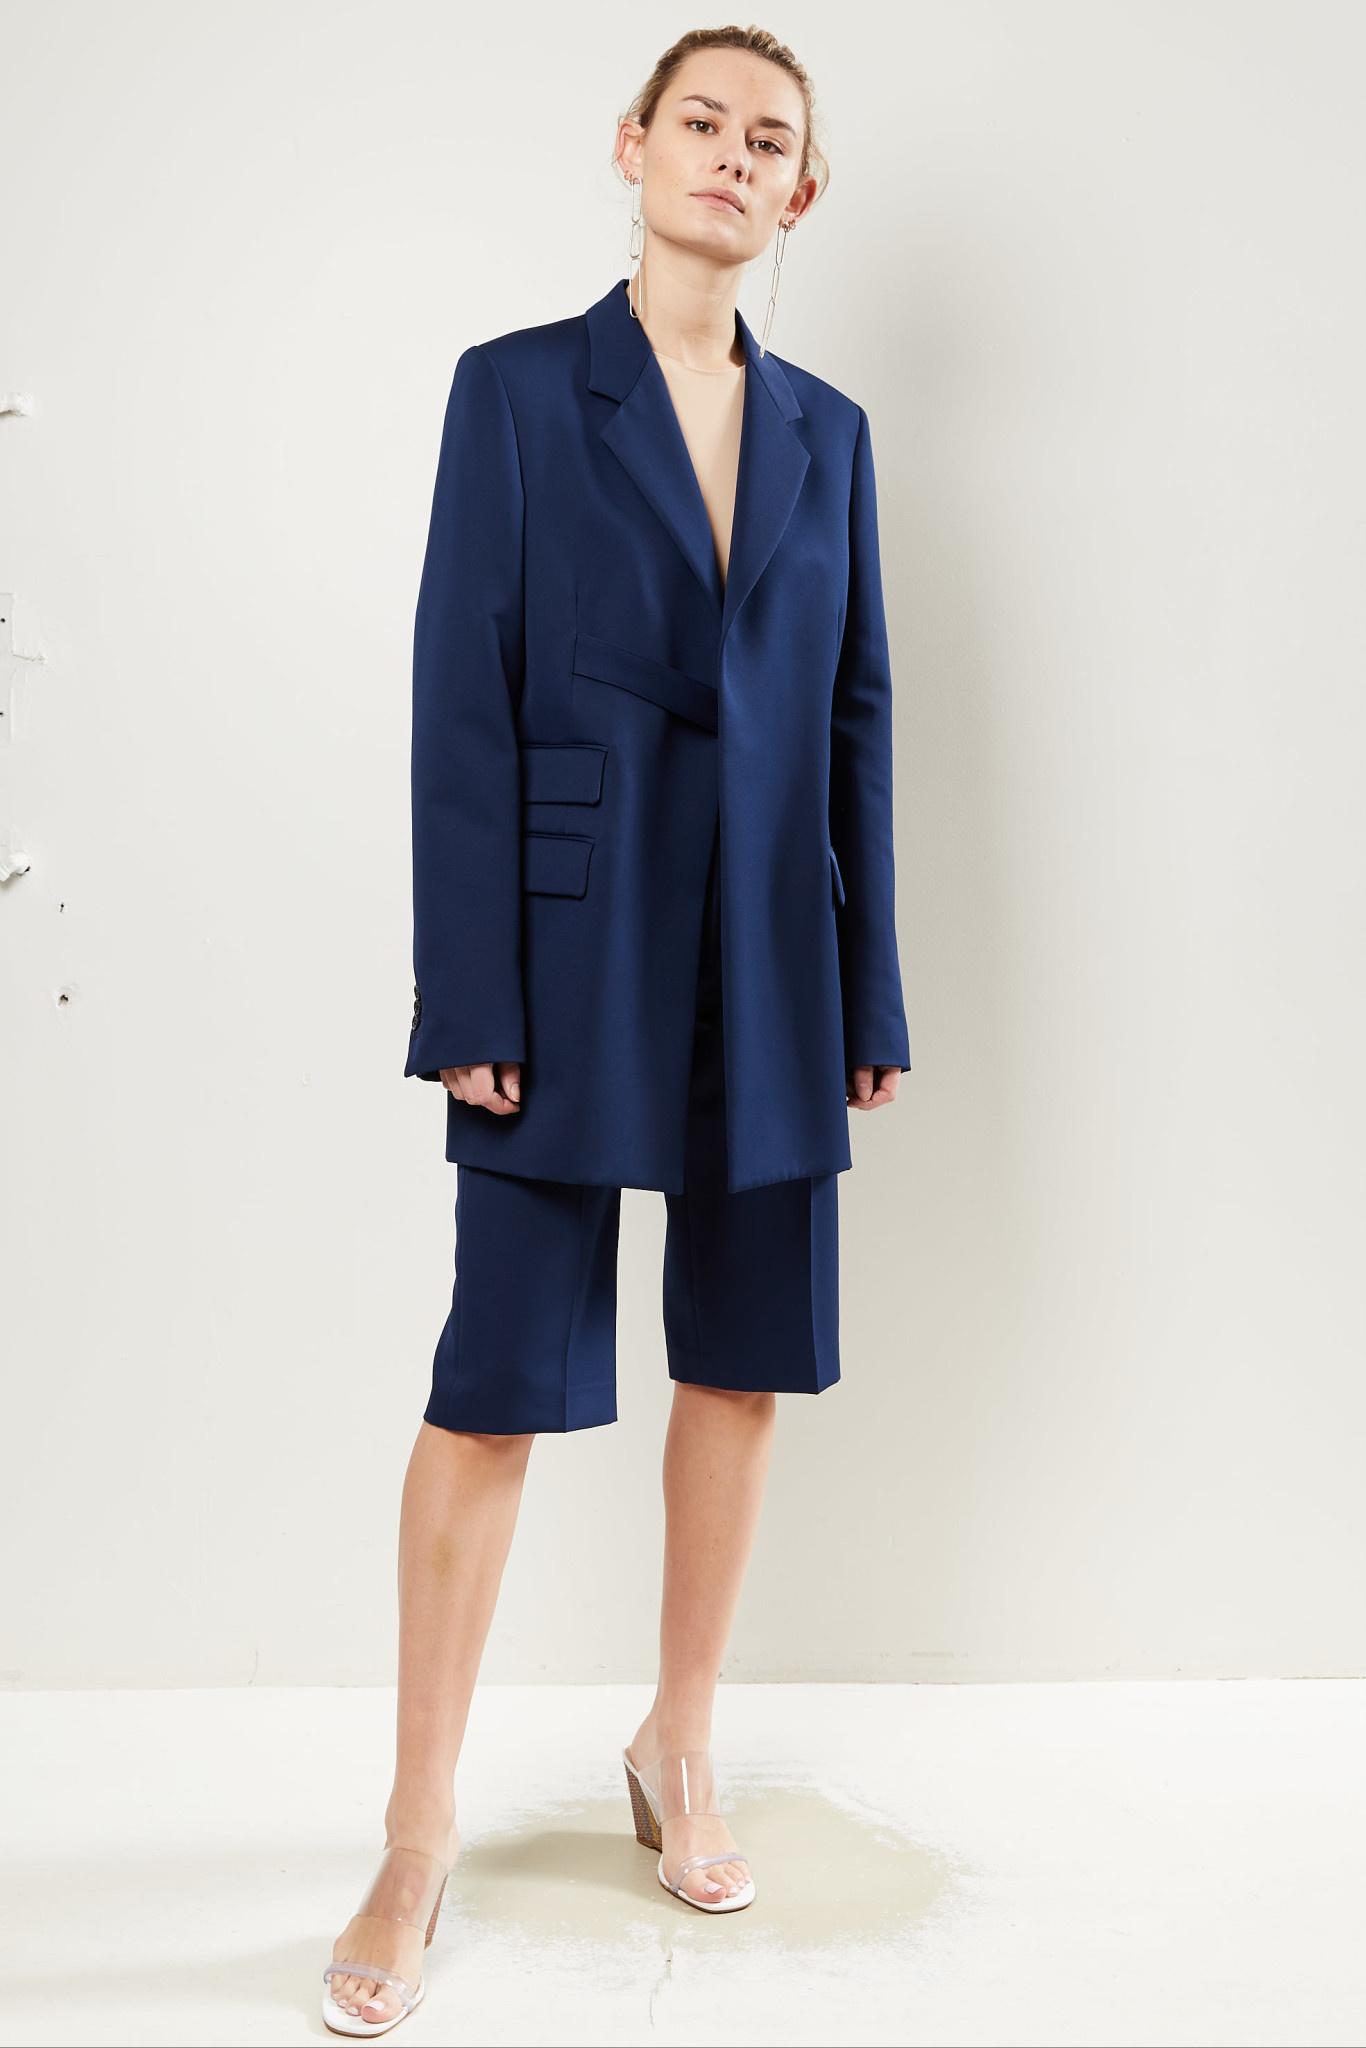 Maison Margiela - Strap tailored blazer.